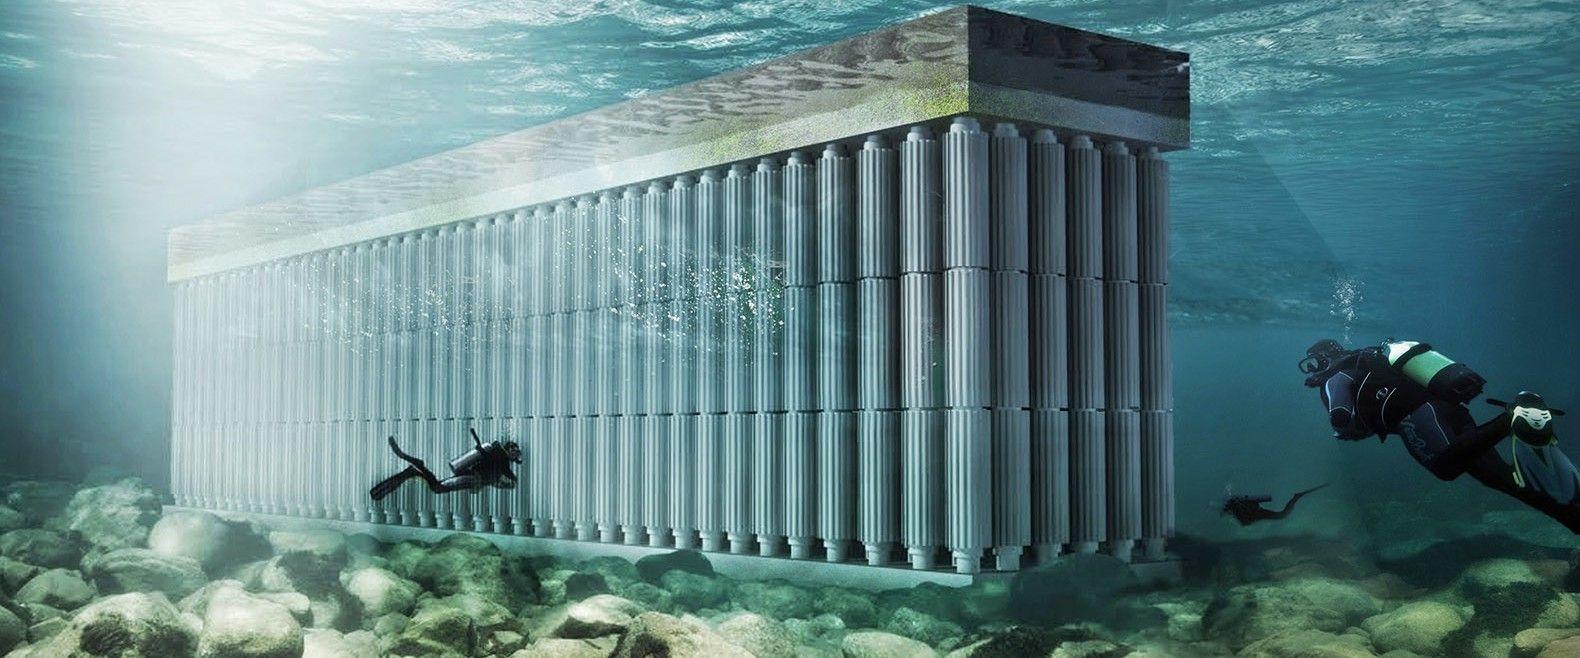 http://inhabitat.com/waterstudios-floating-sea-wall-harvests-blue-energy-from-crashing-water/